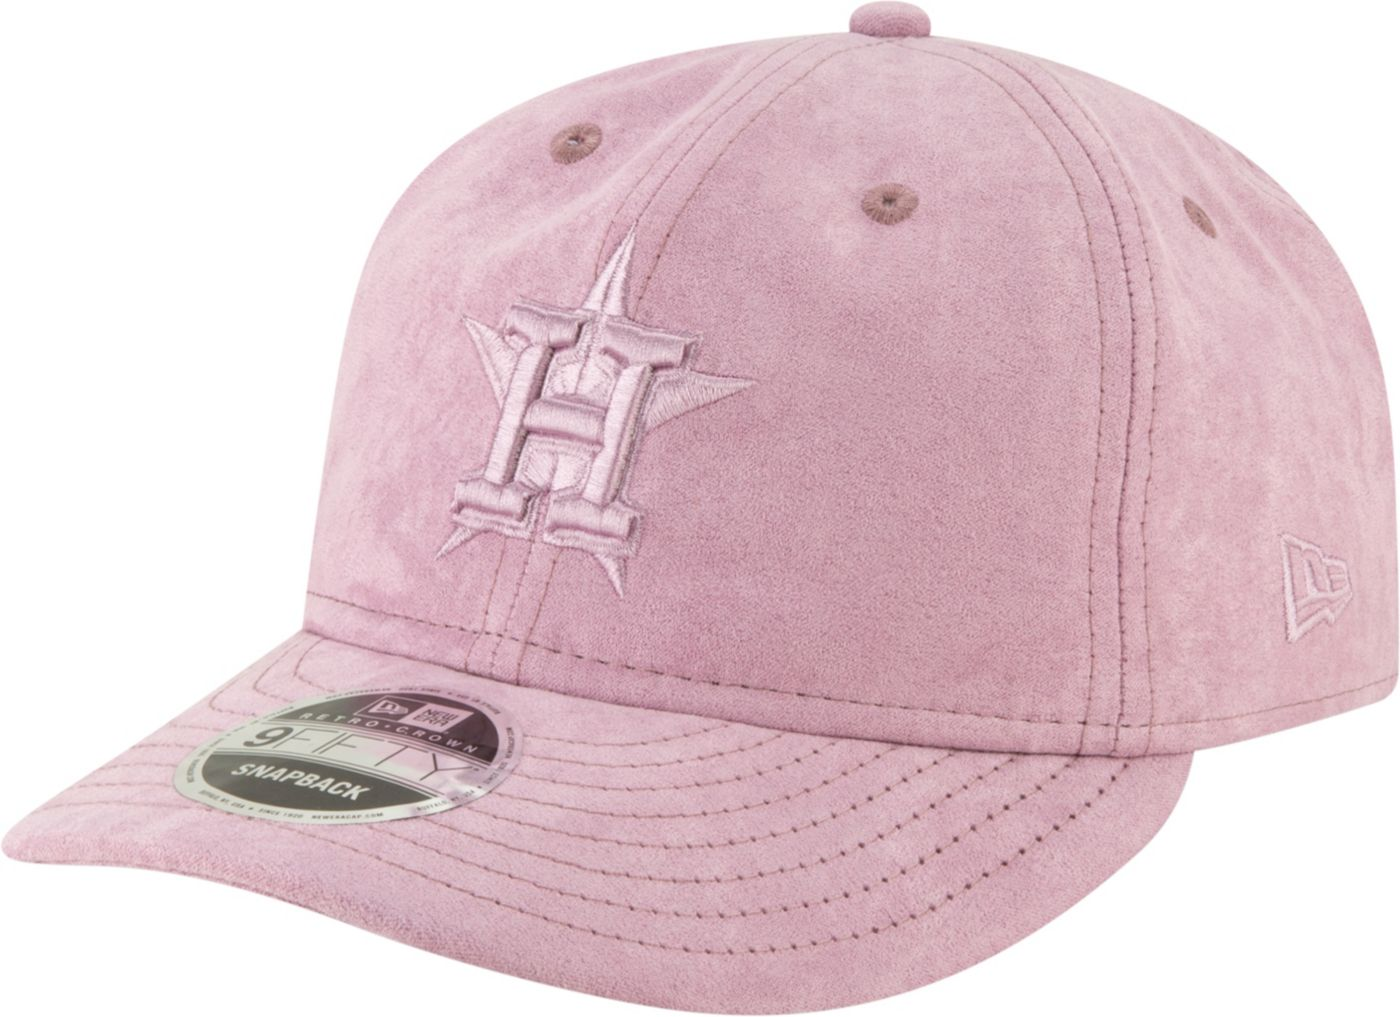 New Era Men's Houston Astros 9Fifty Suede Retro Pink Adjustable Snapback Hat